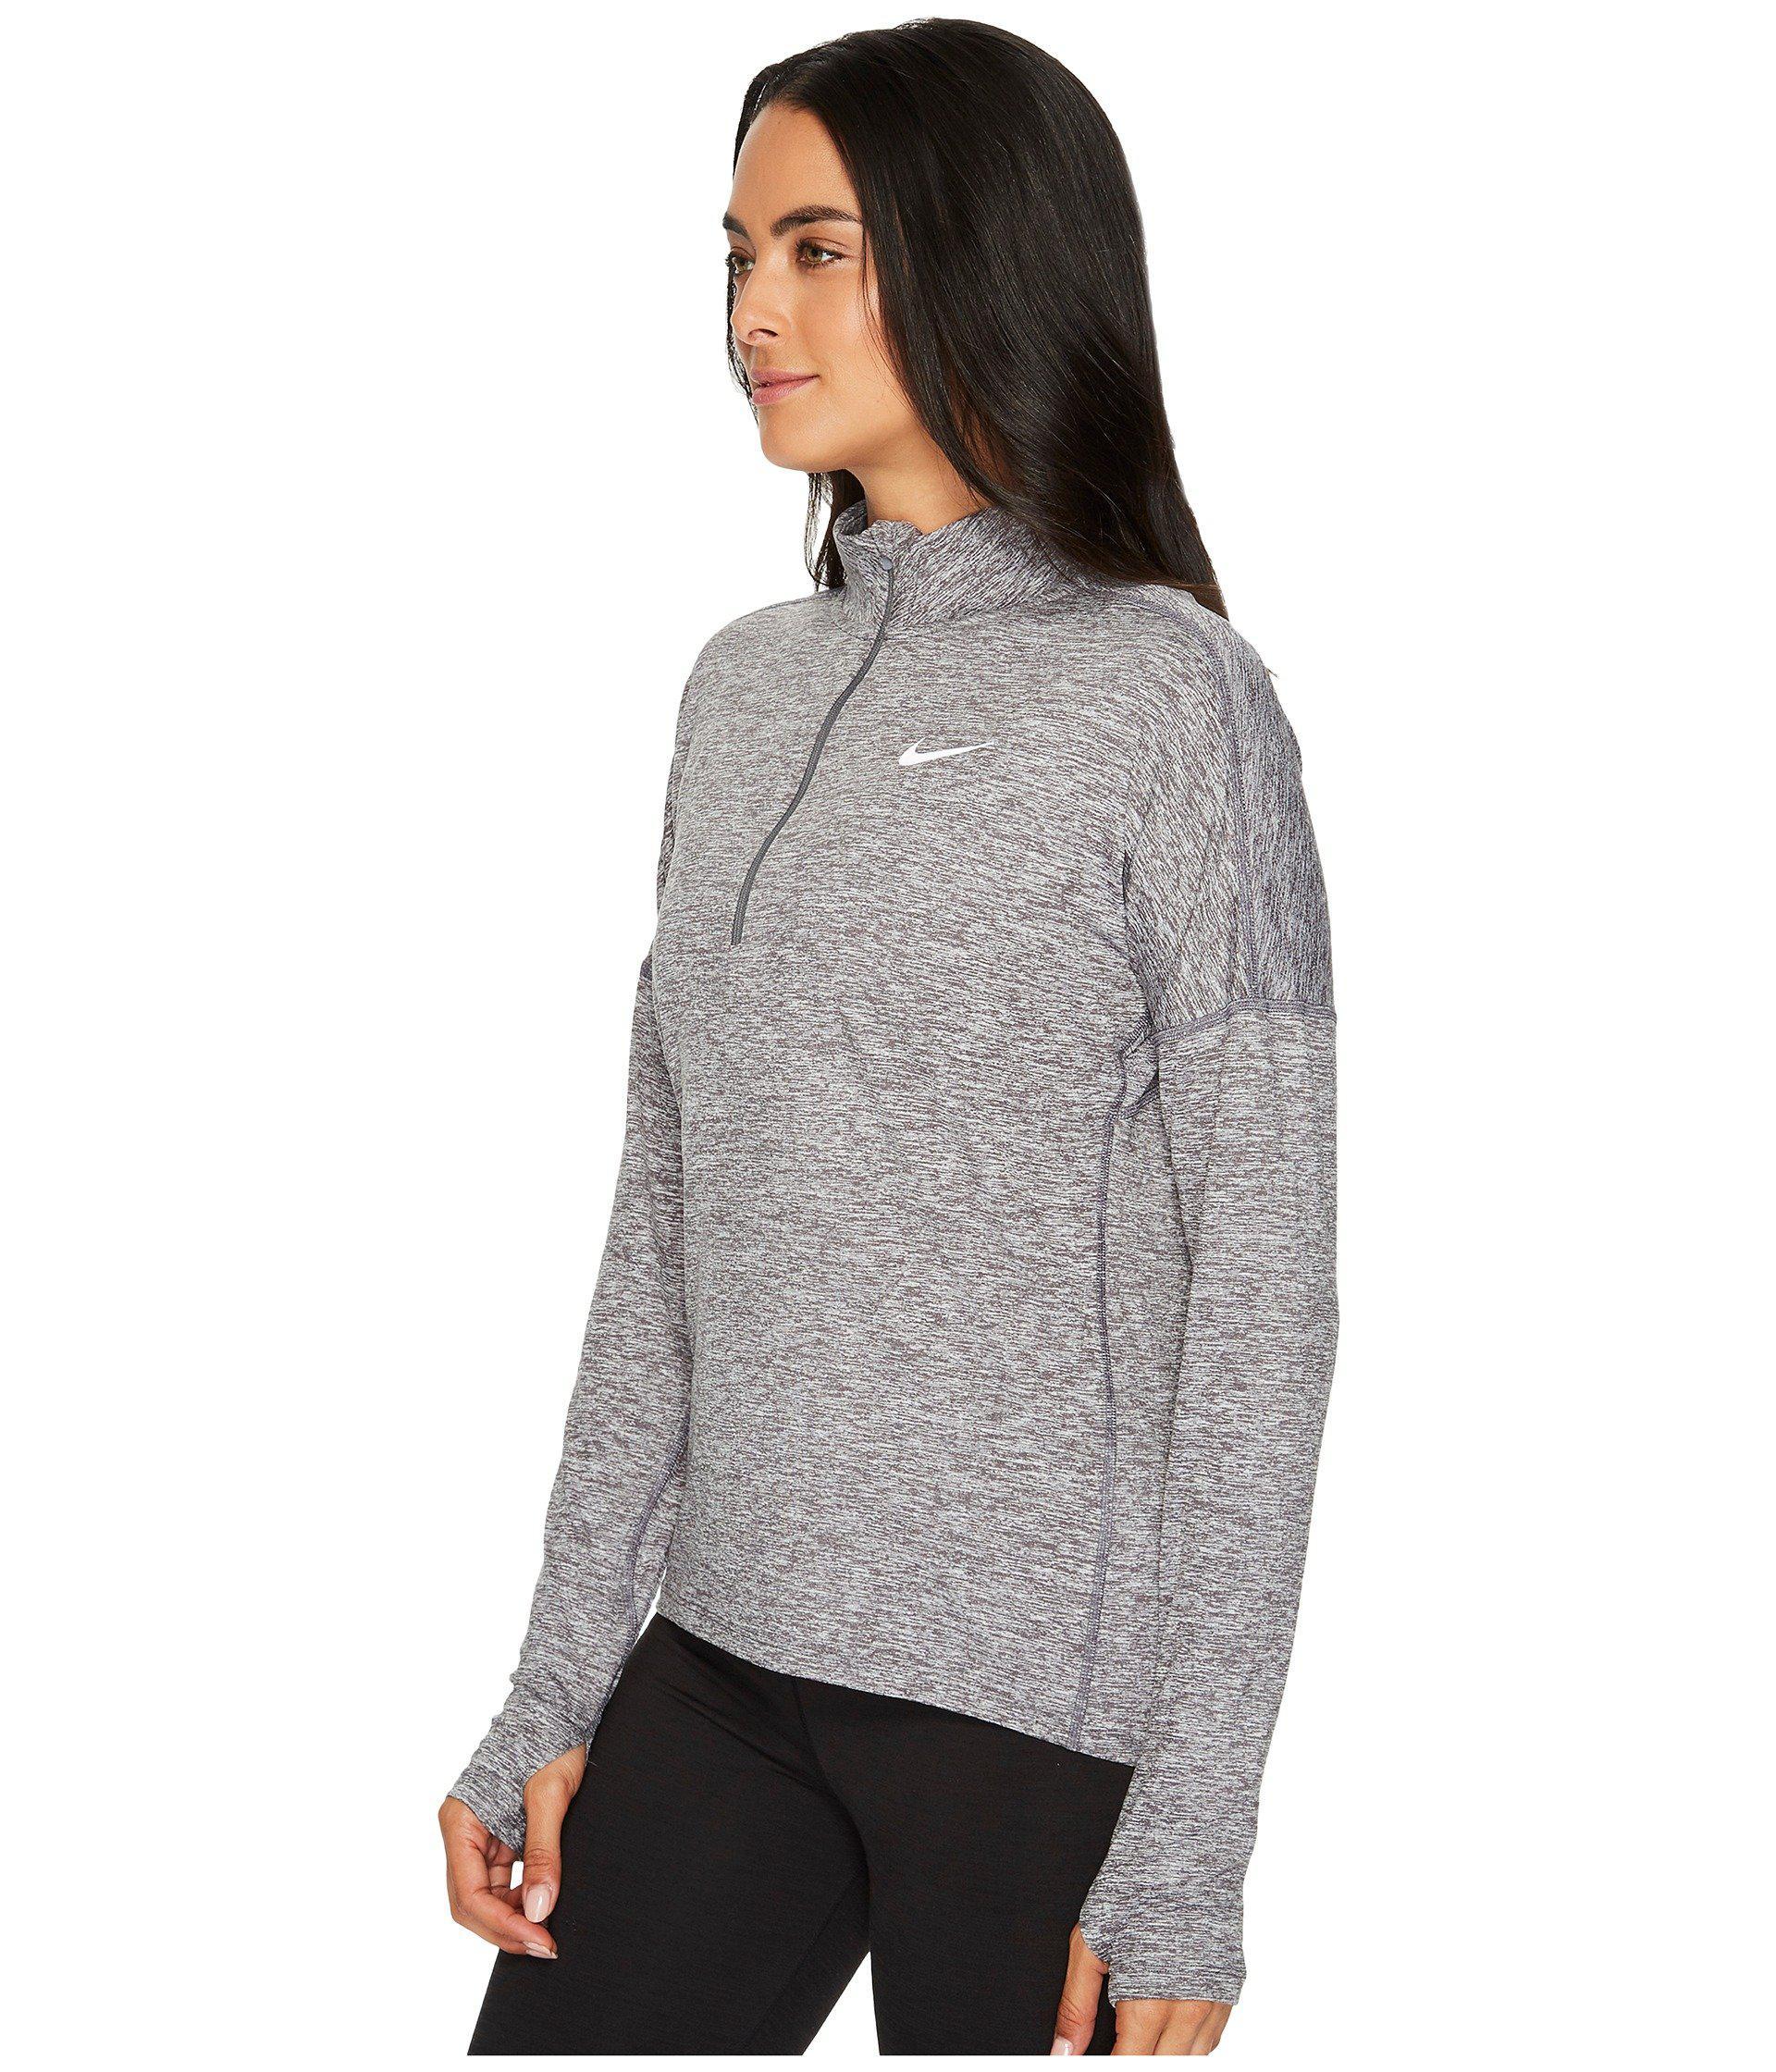 d436ba4a3ec1 Lyst - Nike Dry Element 1 2 Zip Running Top in Gray